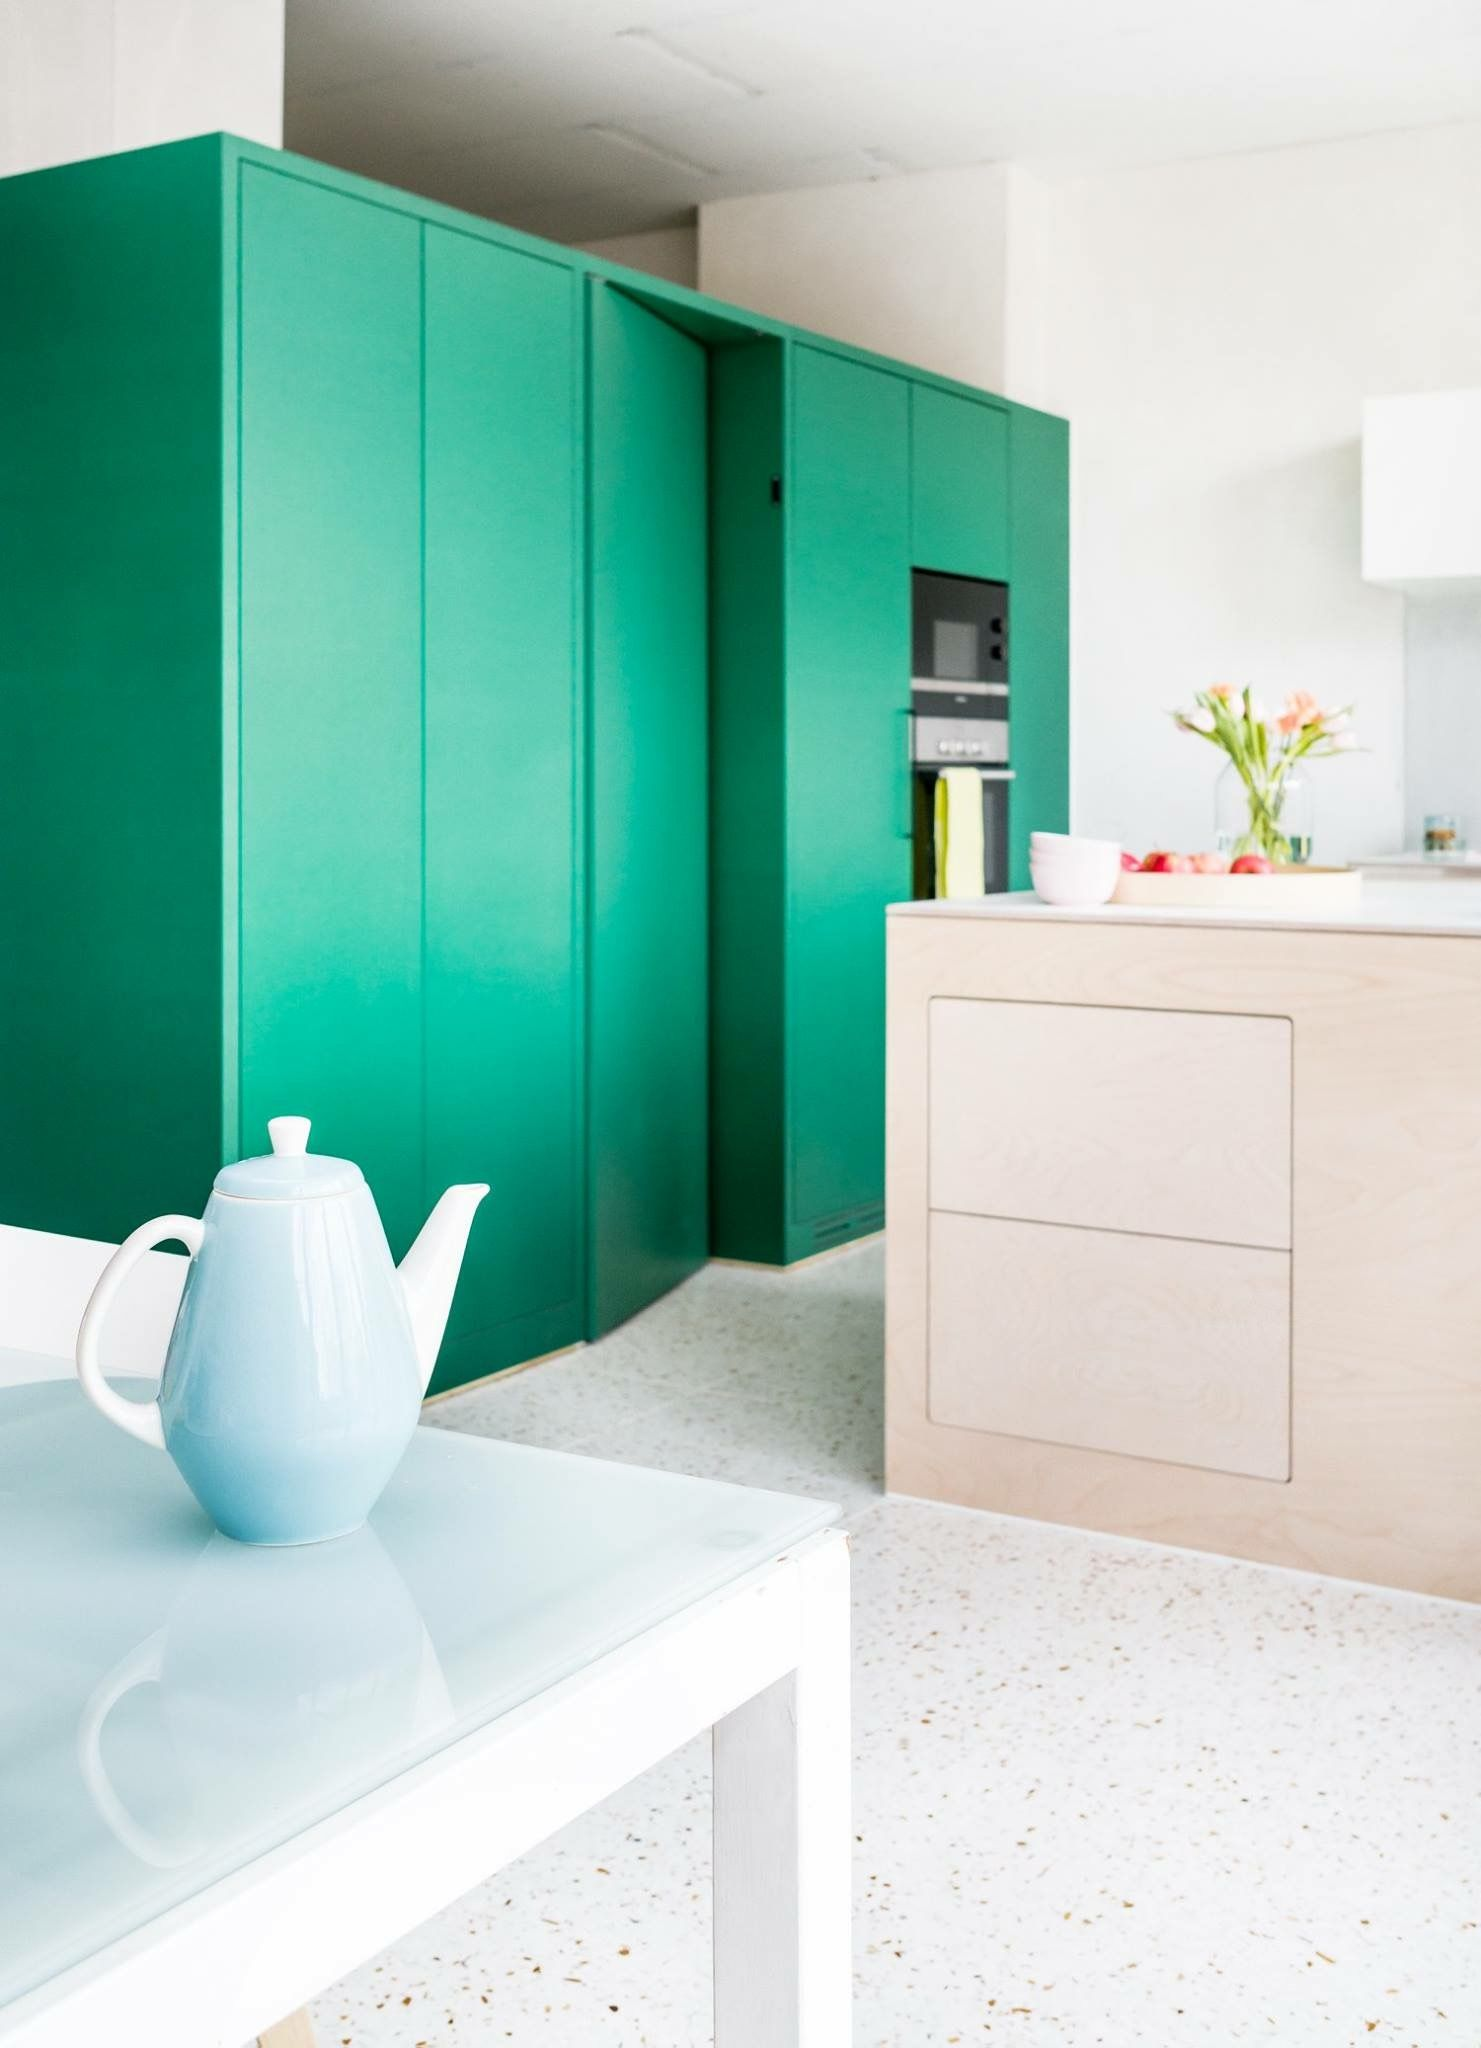 Pin by Elke Blyweert on interior | Pinterest | Modern kitchen ...